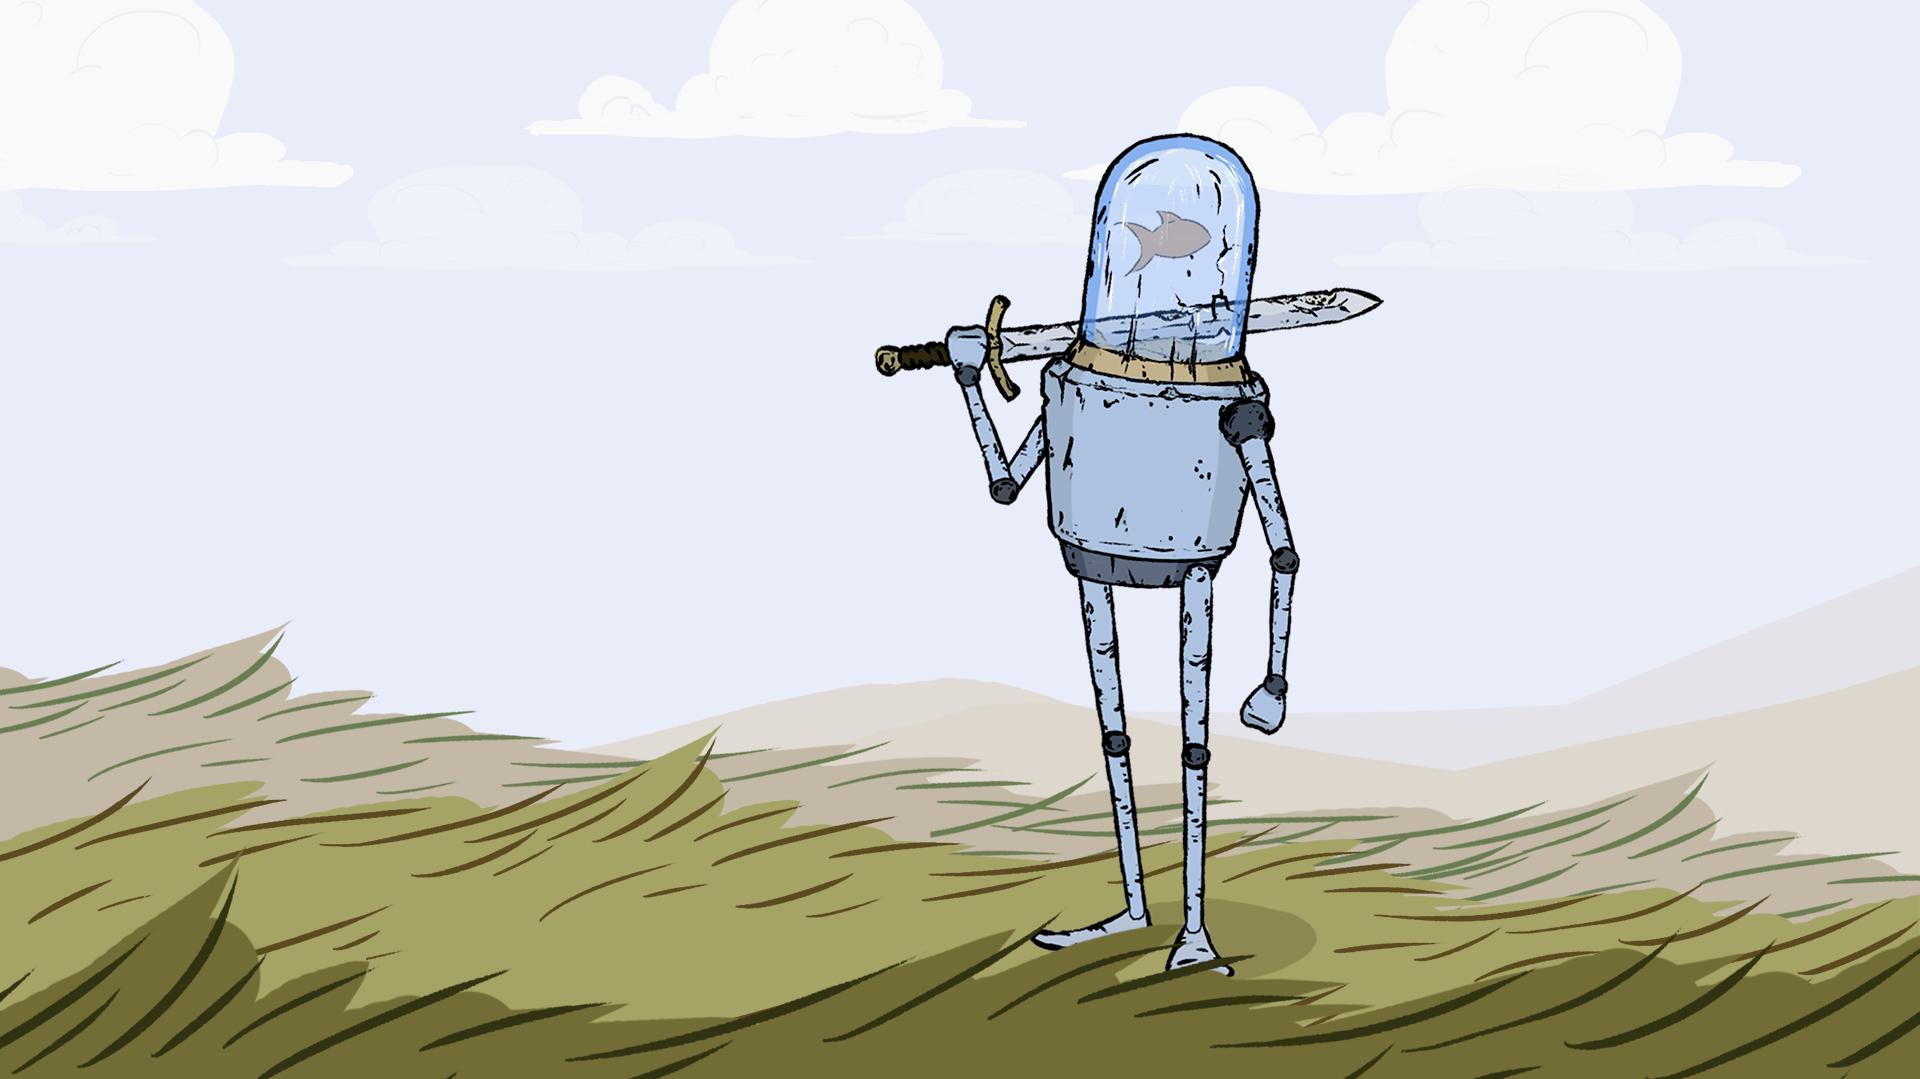 robot01bg_wide.png